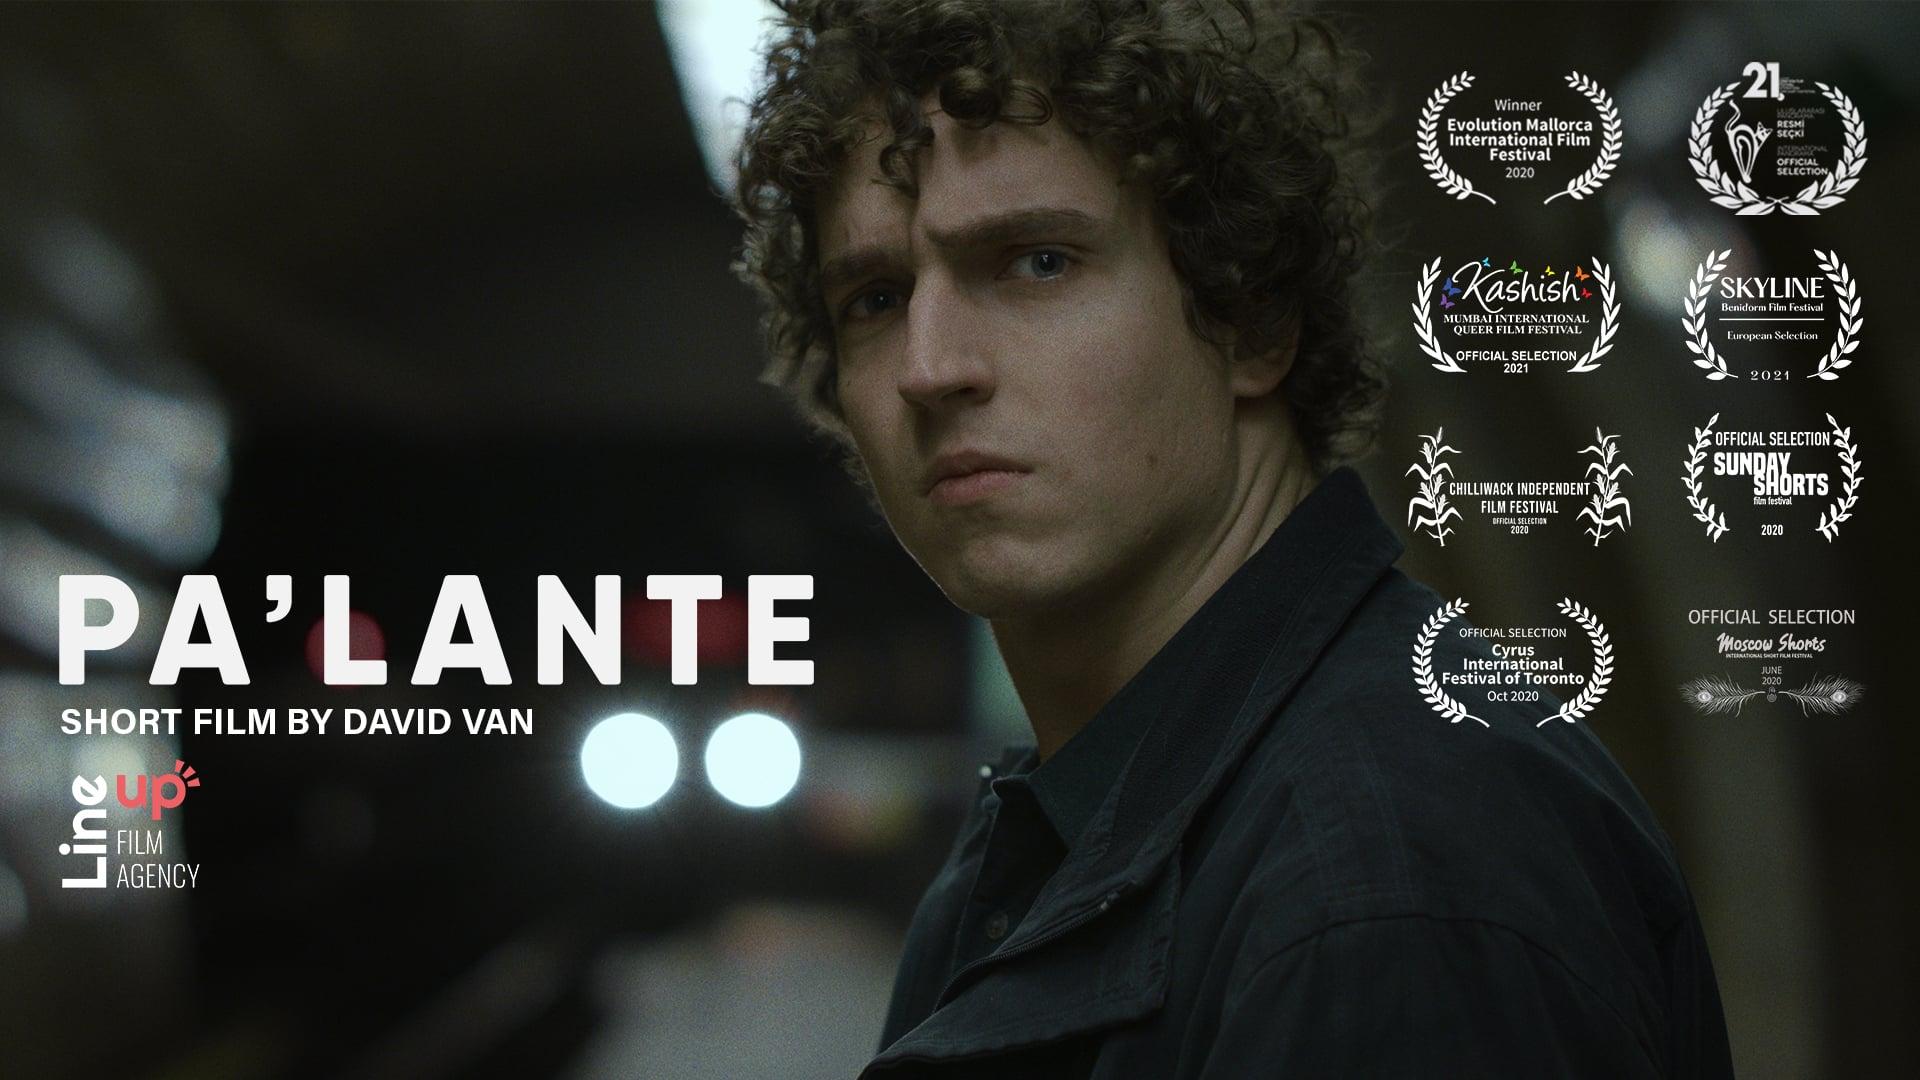 Trailer - Pa'lante (David Van, 2020) - Subt. español